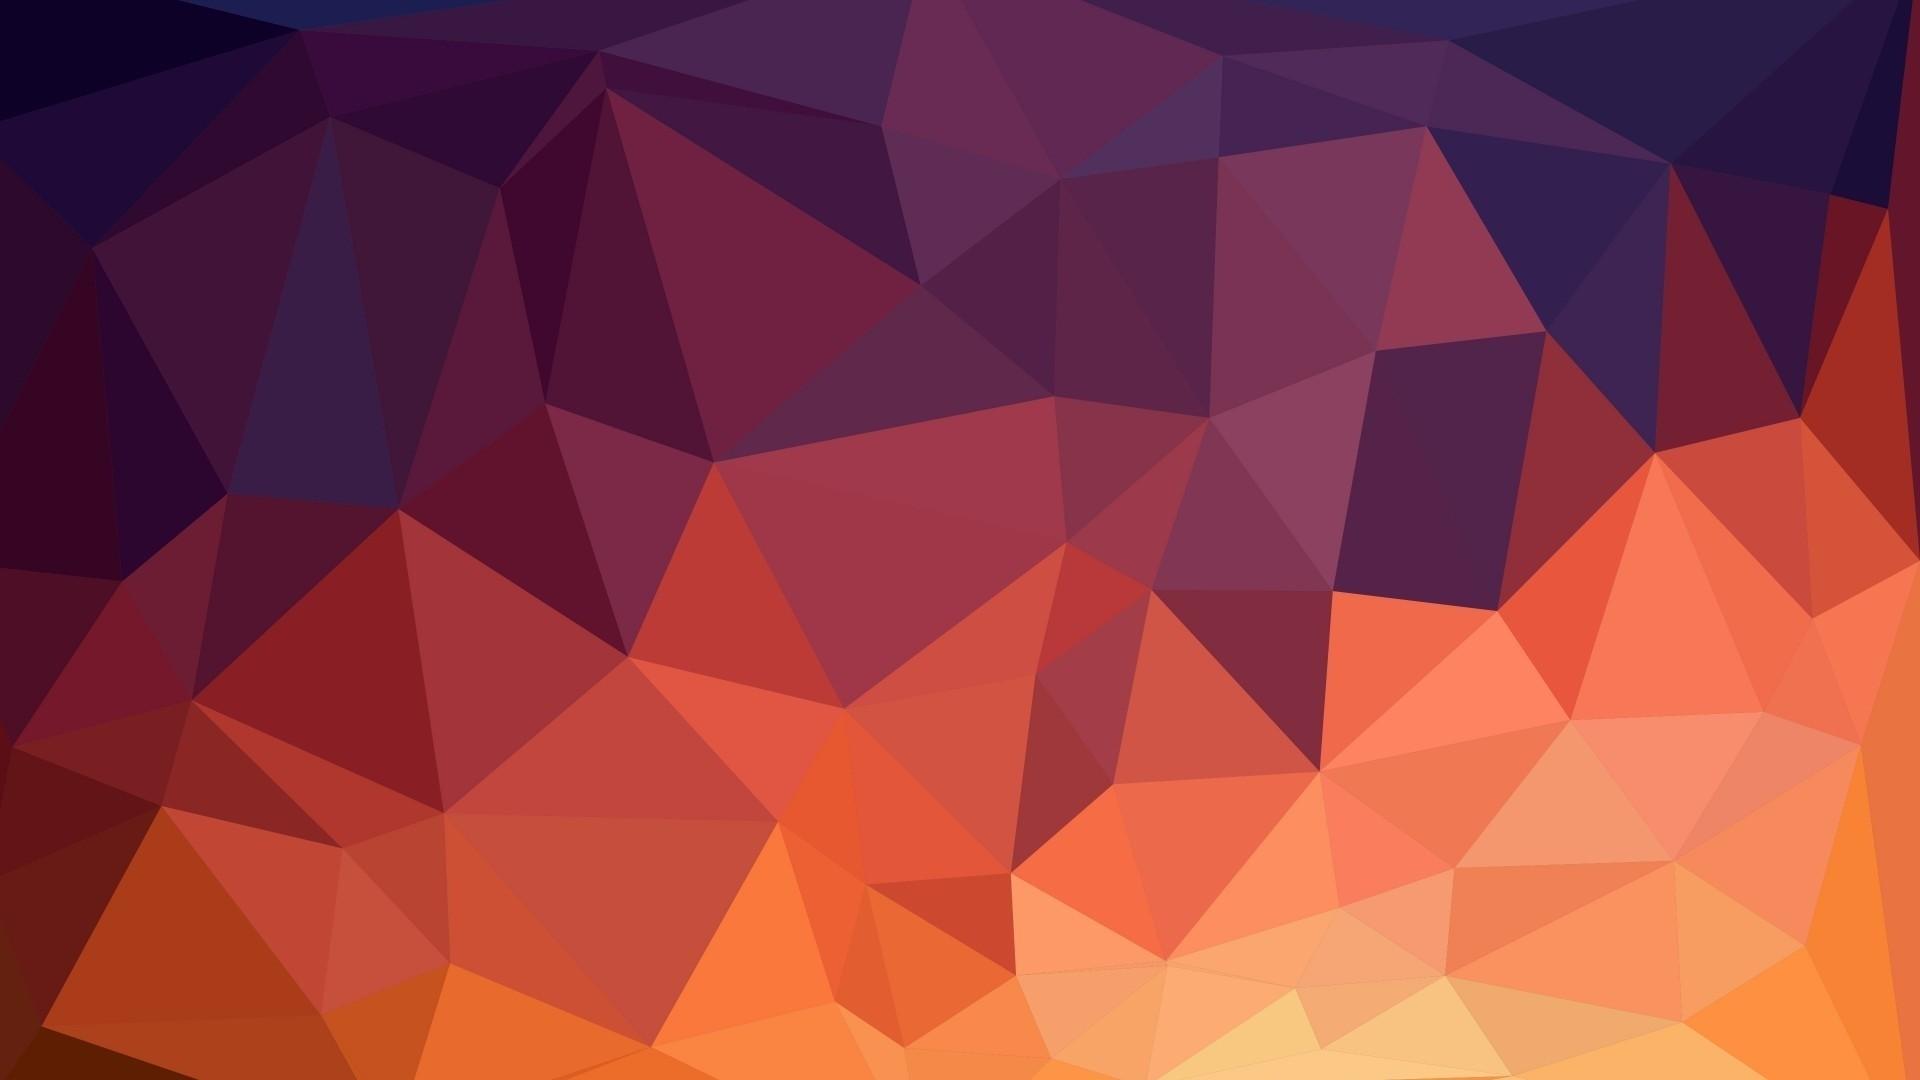 Geometric Desktop Wallpaper